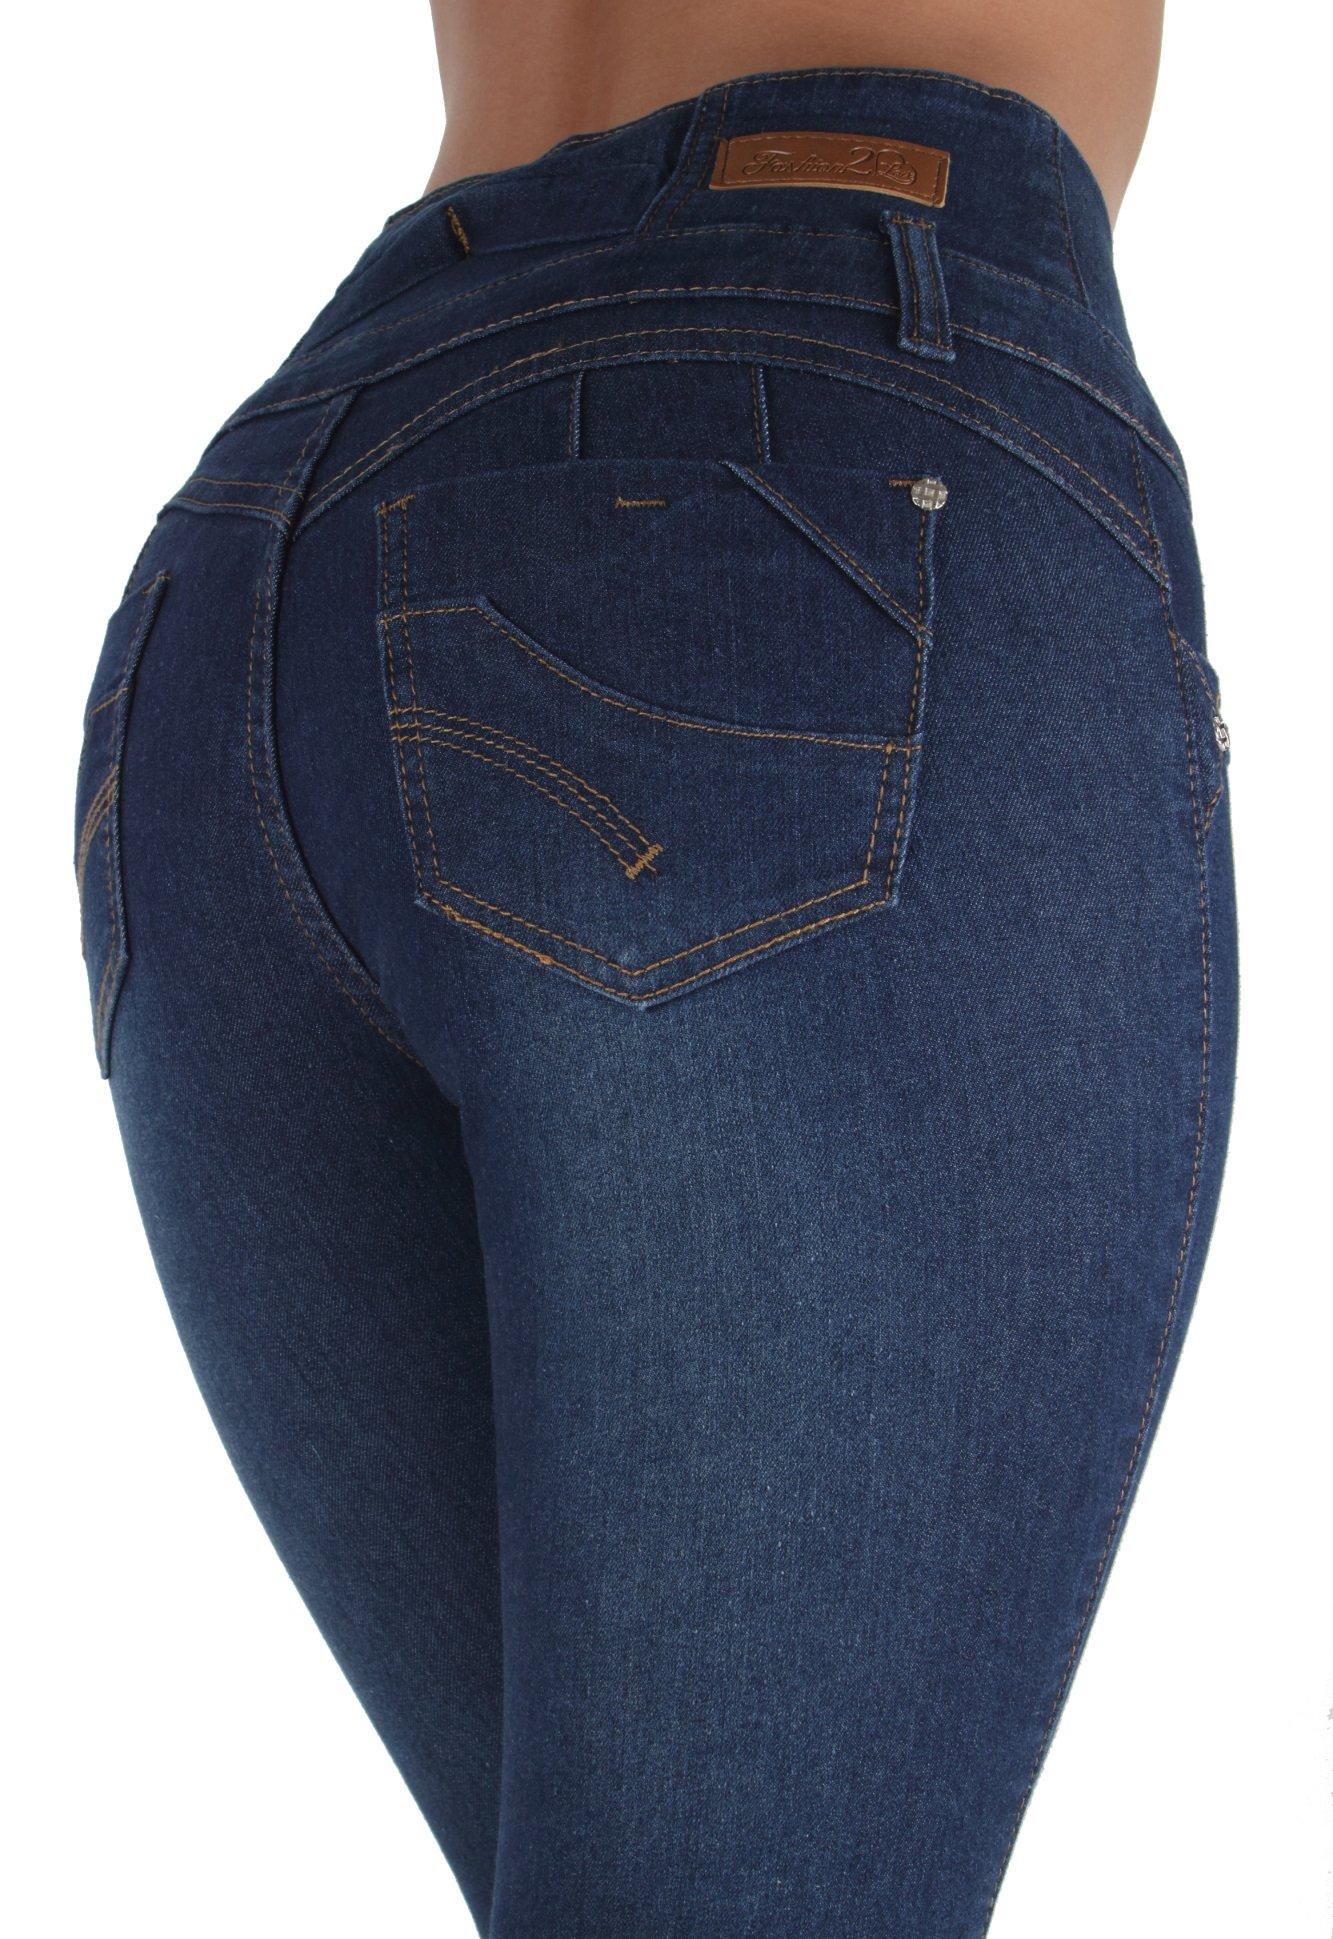 Fashion2Love LS8-88711S– Colombian Design, Butt Lift, Levanta Cola, High Waist, Skinny Jeans in Dark Blue Size 9